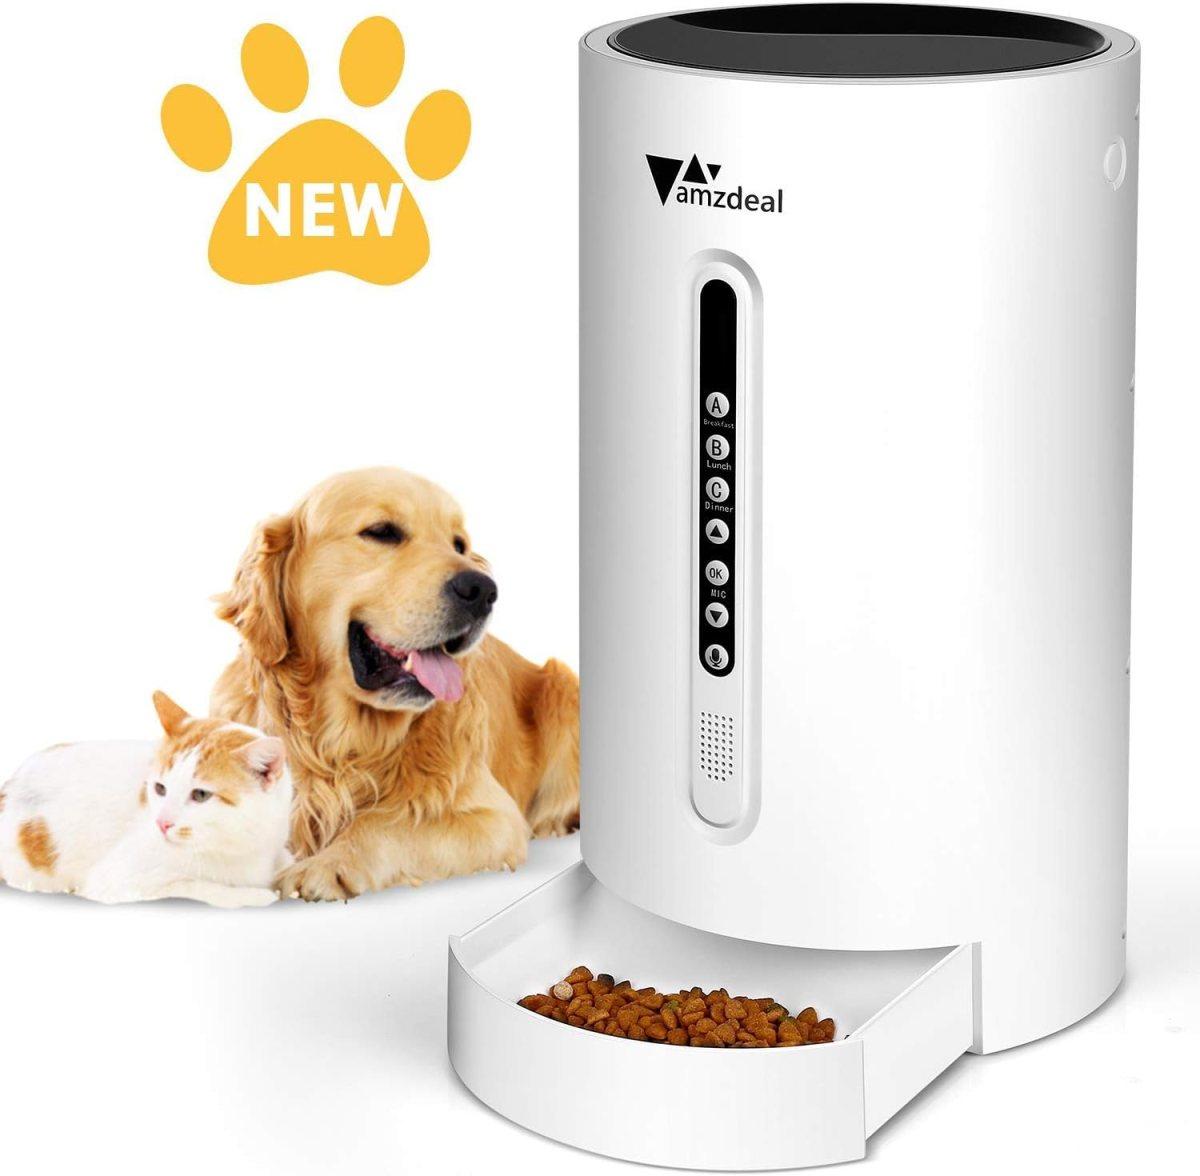 Amzdeal Comedero Automático para Perros Gatos - Dispensador de Comida 4,6 L con Temporizador Programable, Grabación de 16 Segundos y Sensor de Infrarrojos, Pantalla LCD, 4 Comidas al Día para Mascotas